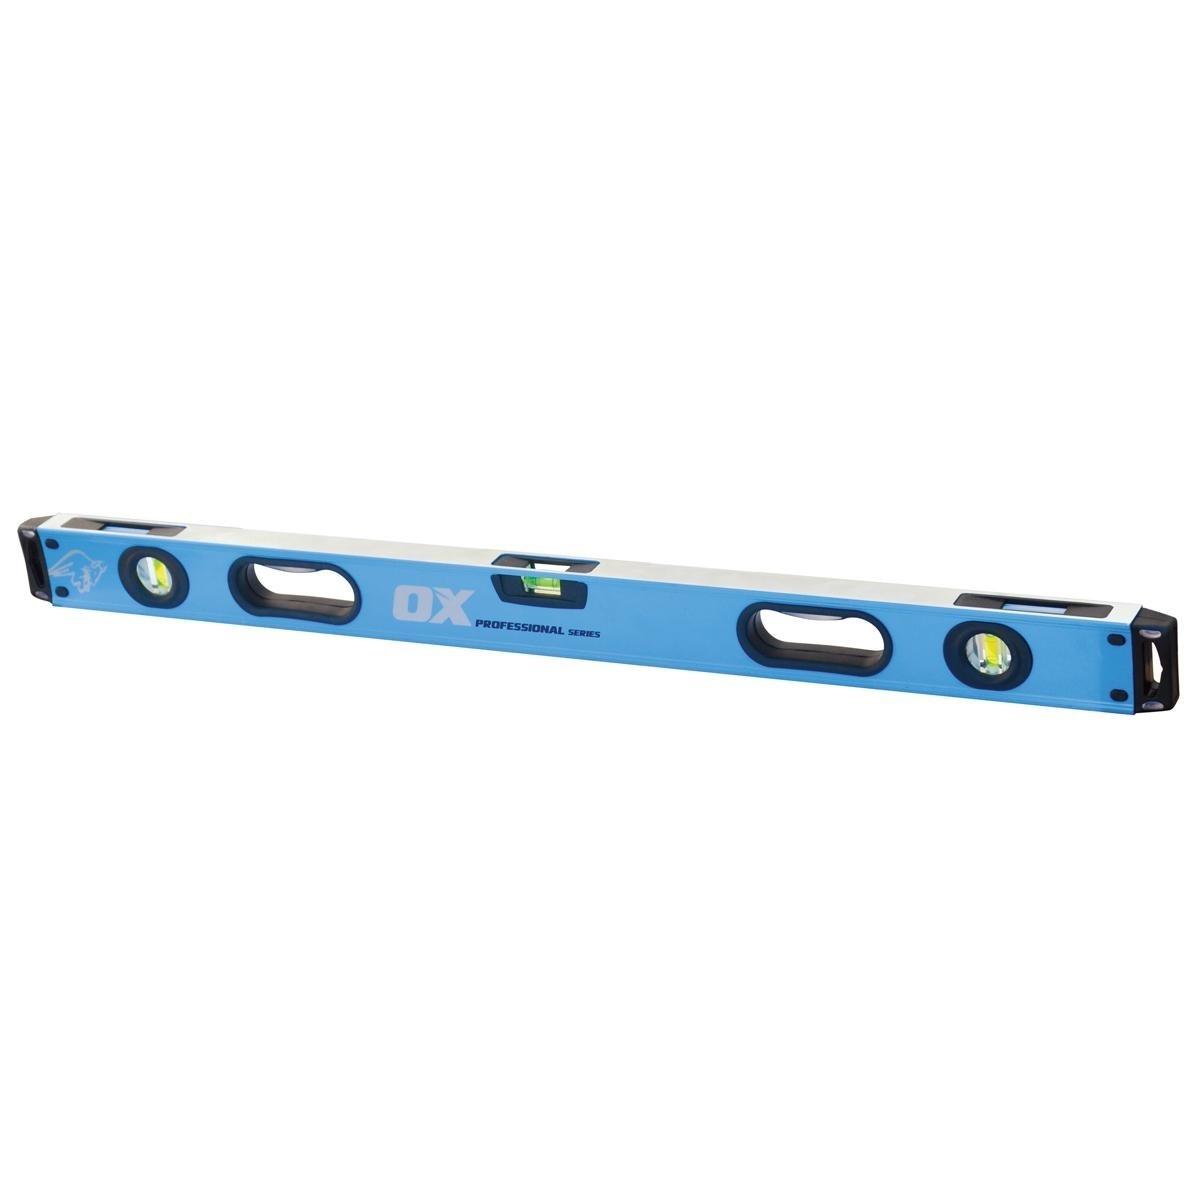 Vattenpass Heavy Duty OX Tools